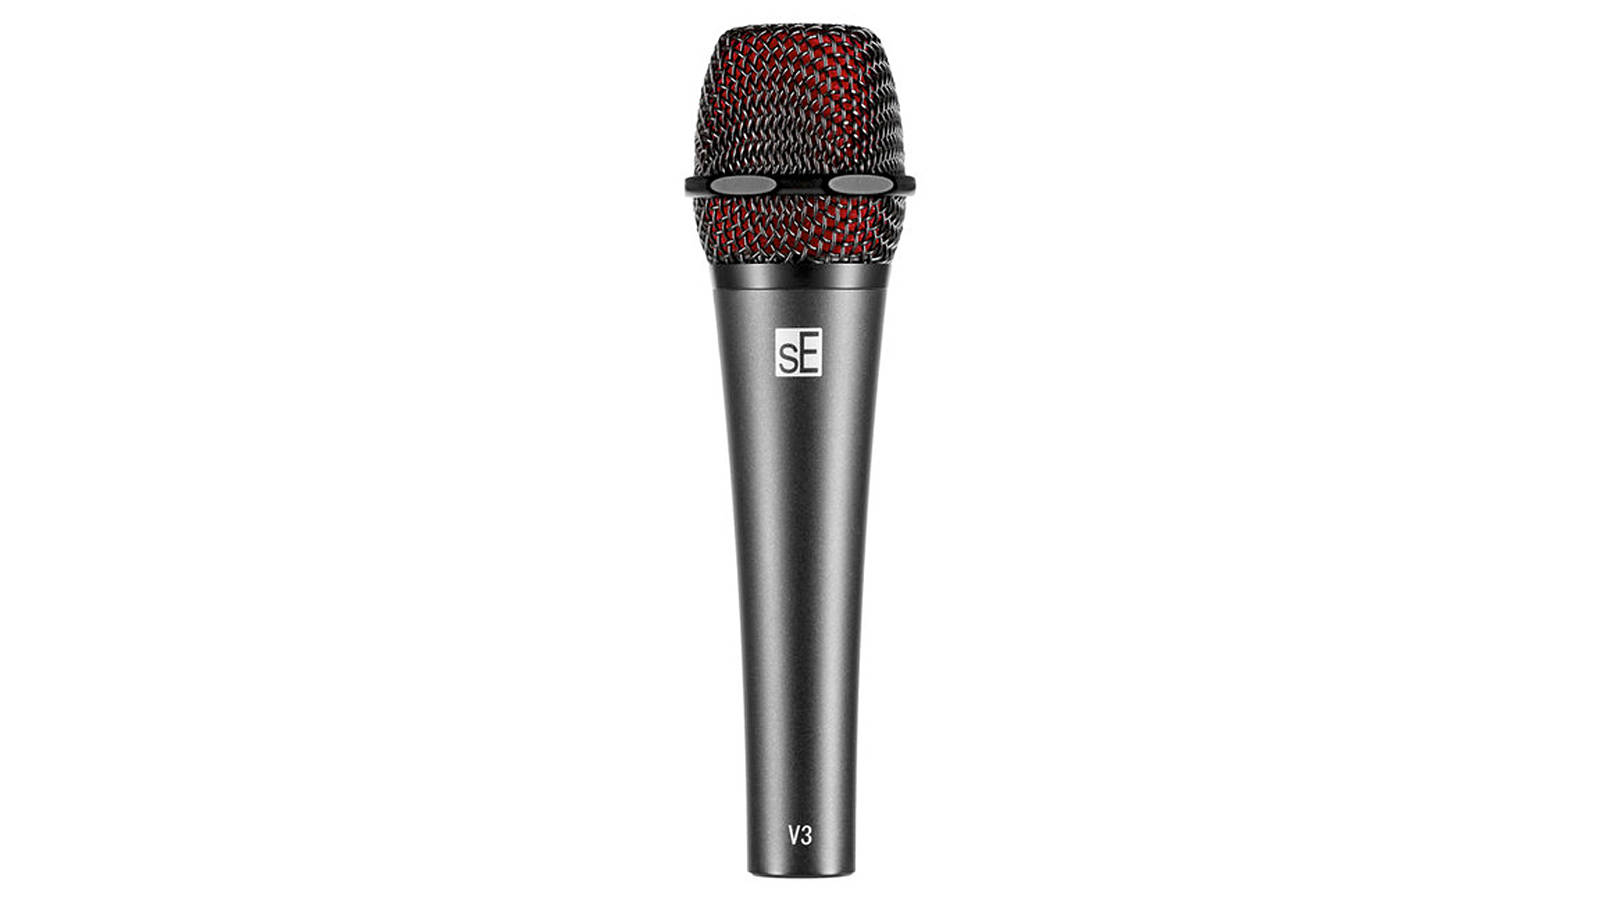 sE Electronics V3 dynamisches Gesangsmikrofon